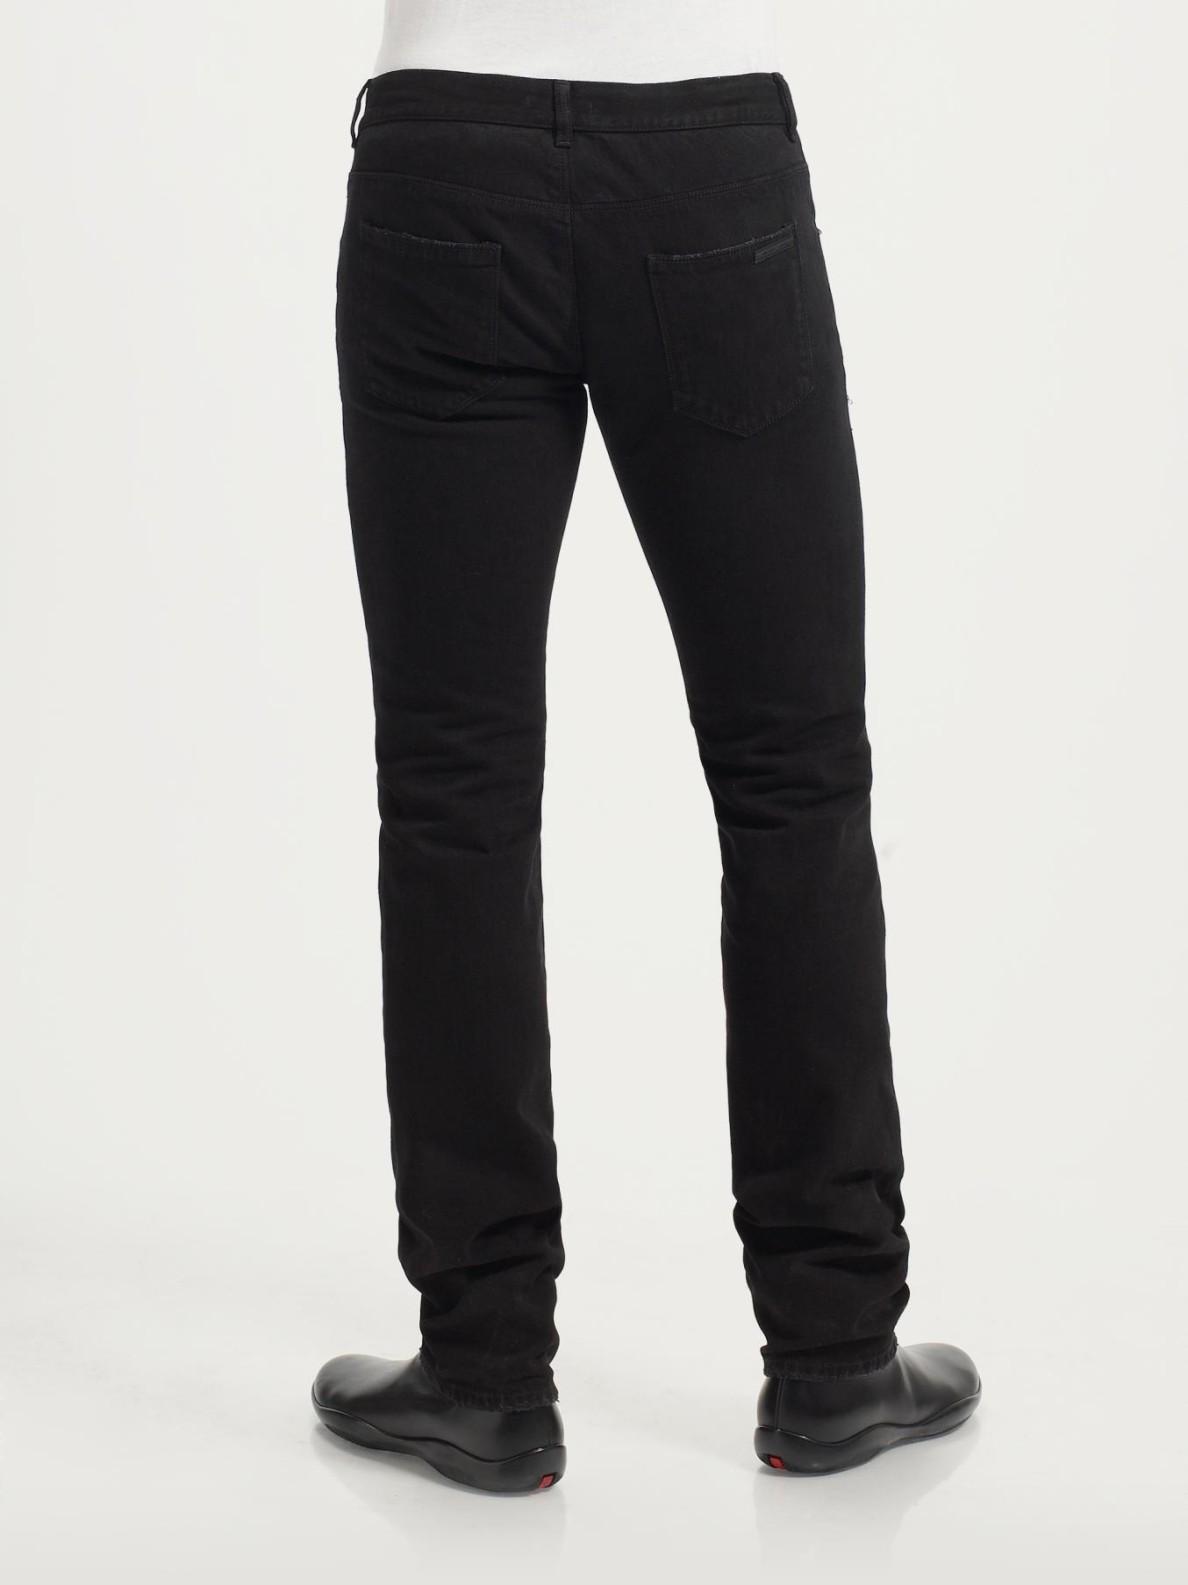 Black Slim Leg Jeans